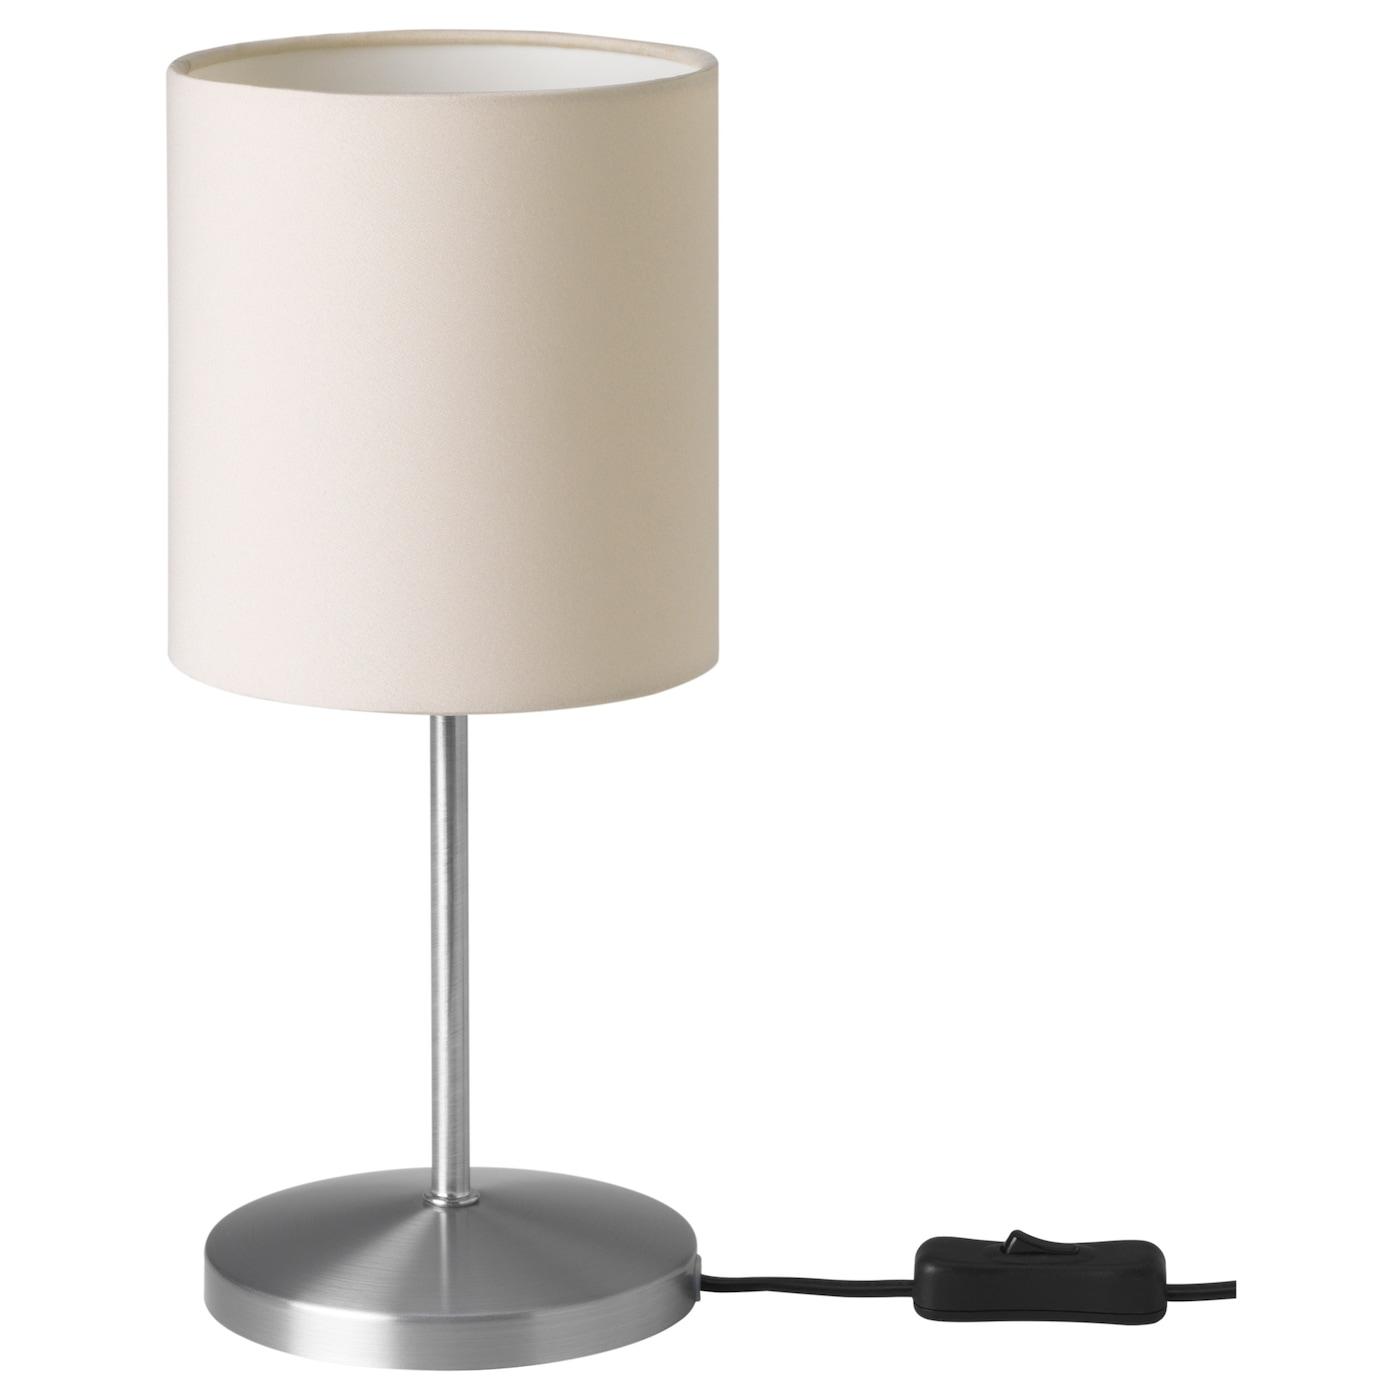 ingared tafellamp beige 30 cm ikea. Black Bedroom Furniture Sets. Home Design Ideas